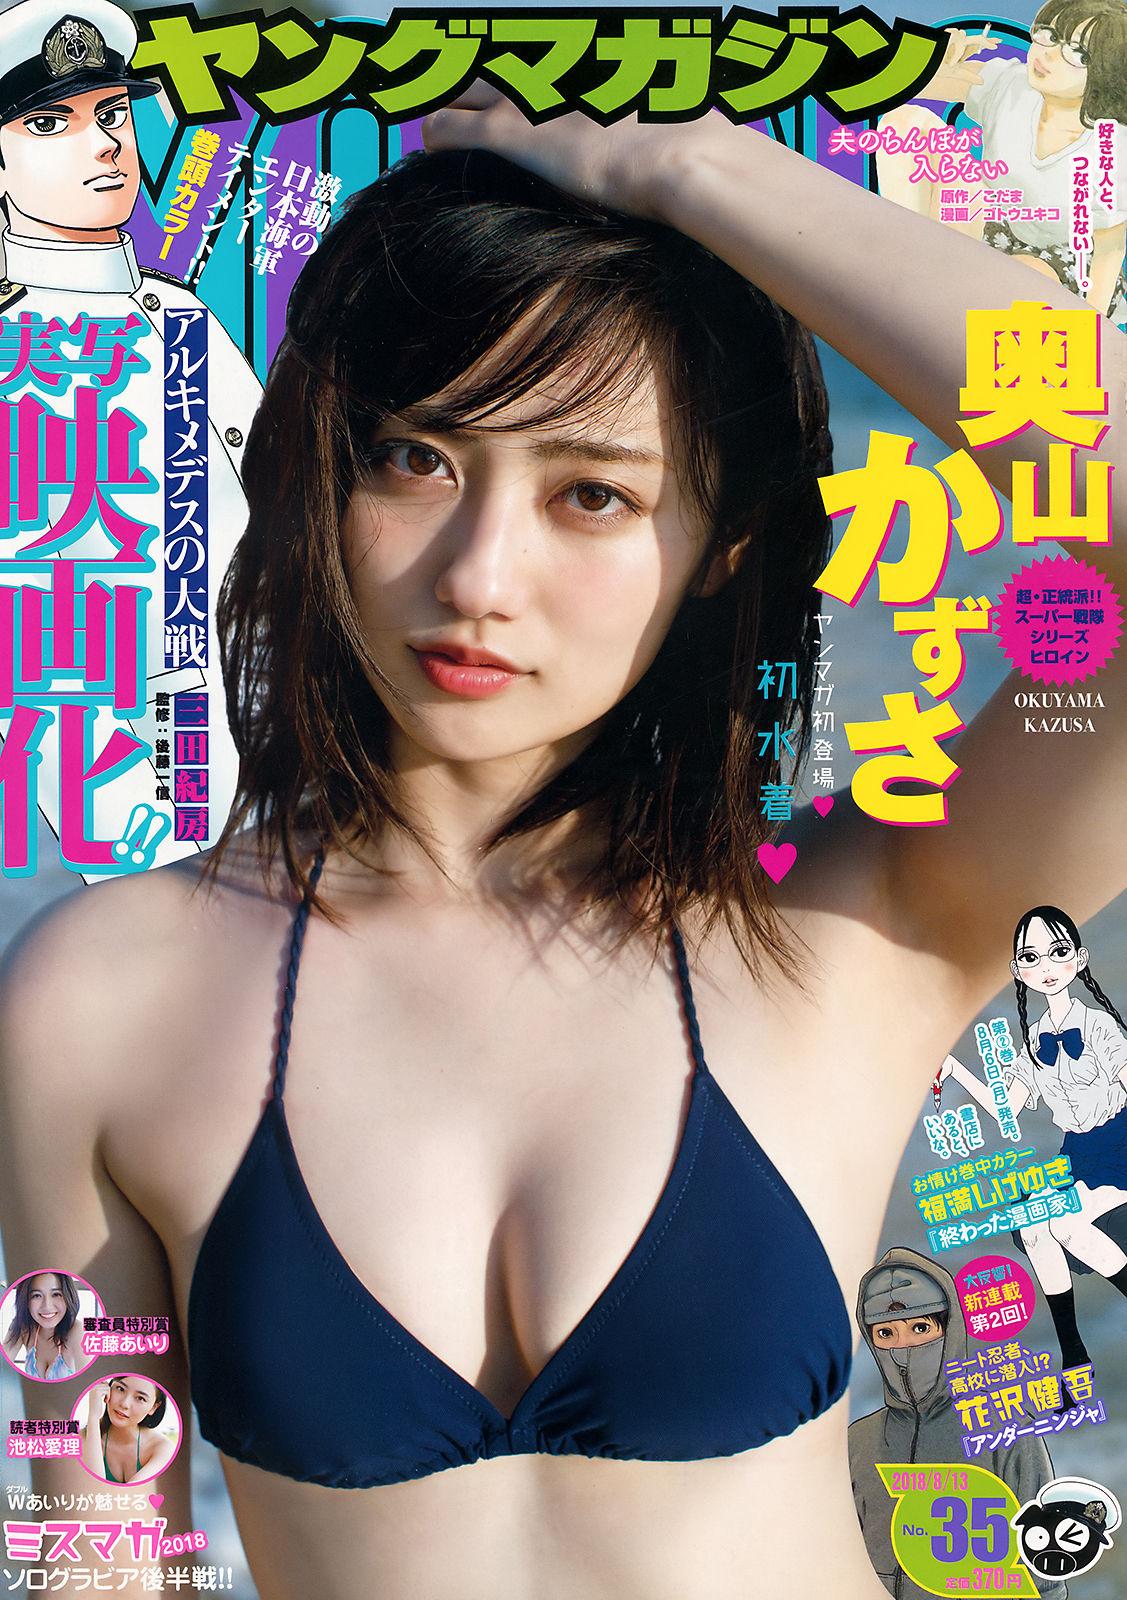 VOL.369 [Young Magazine]杂志:奥山かずさ超高清写真套图(17P)